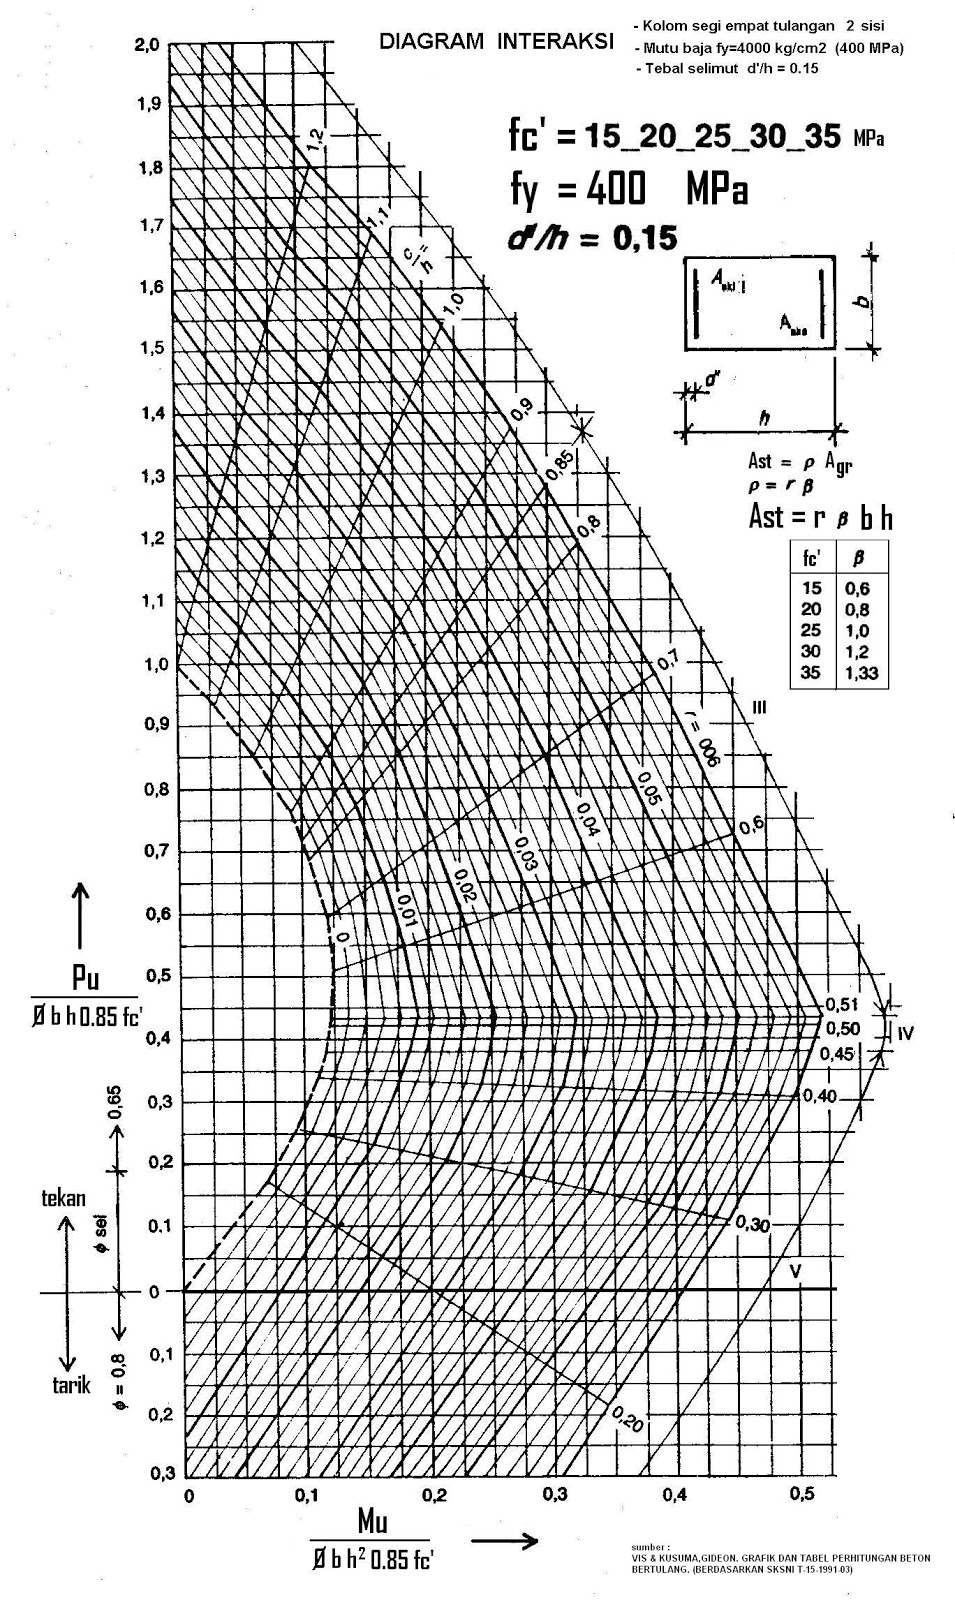 Struktur beton 1 grafik perencanaan kolom persegi diagram interaksi kolom persegi tulangan pada 2 sisi ccuart Image collections